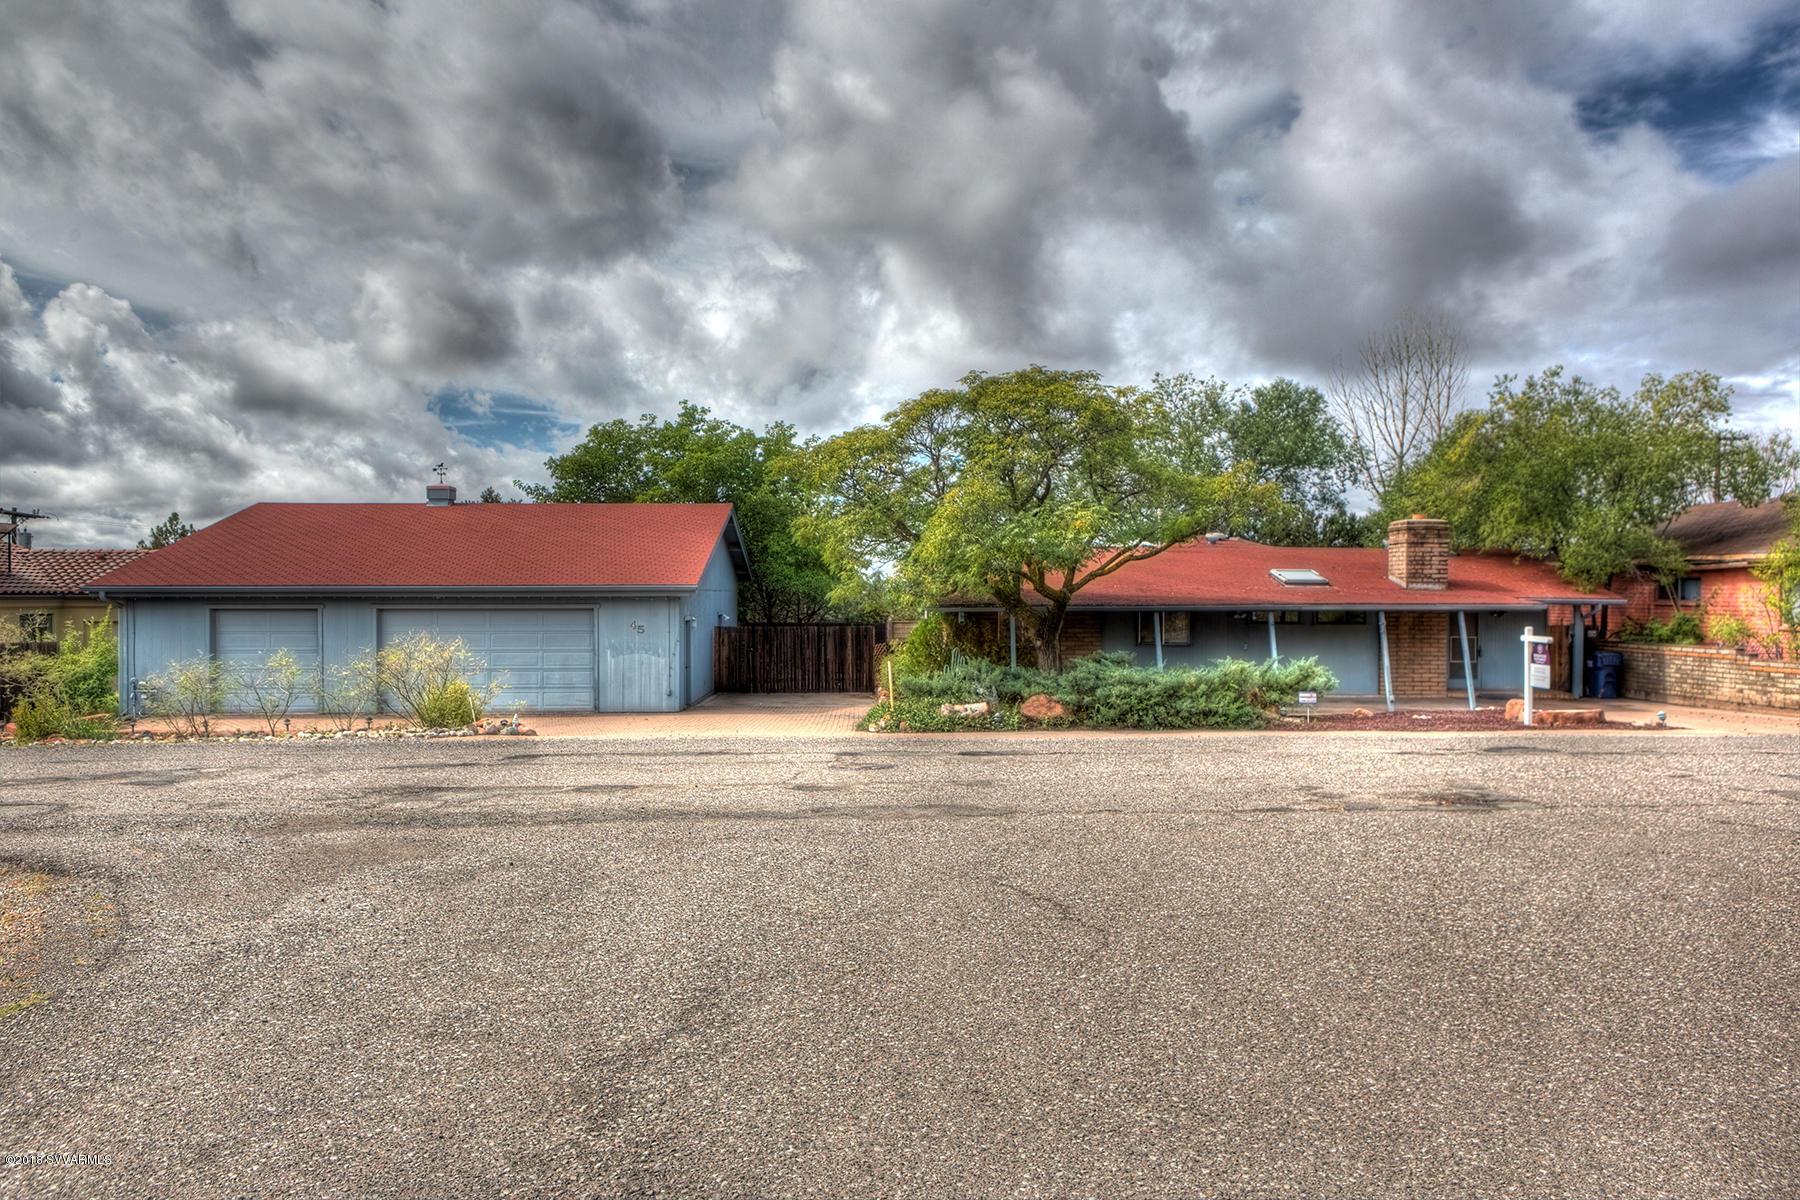 35, 45 Grounds Drive Sedona, AZ 86336